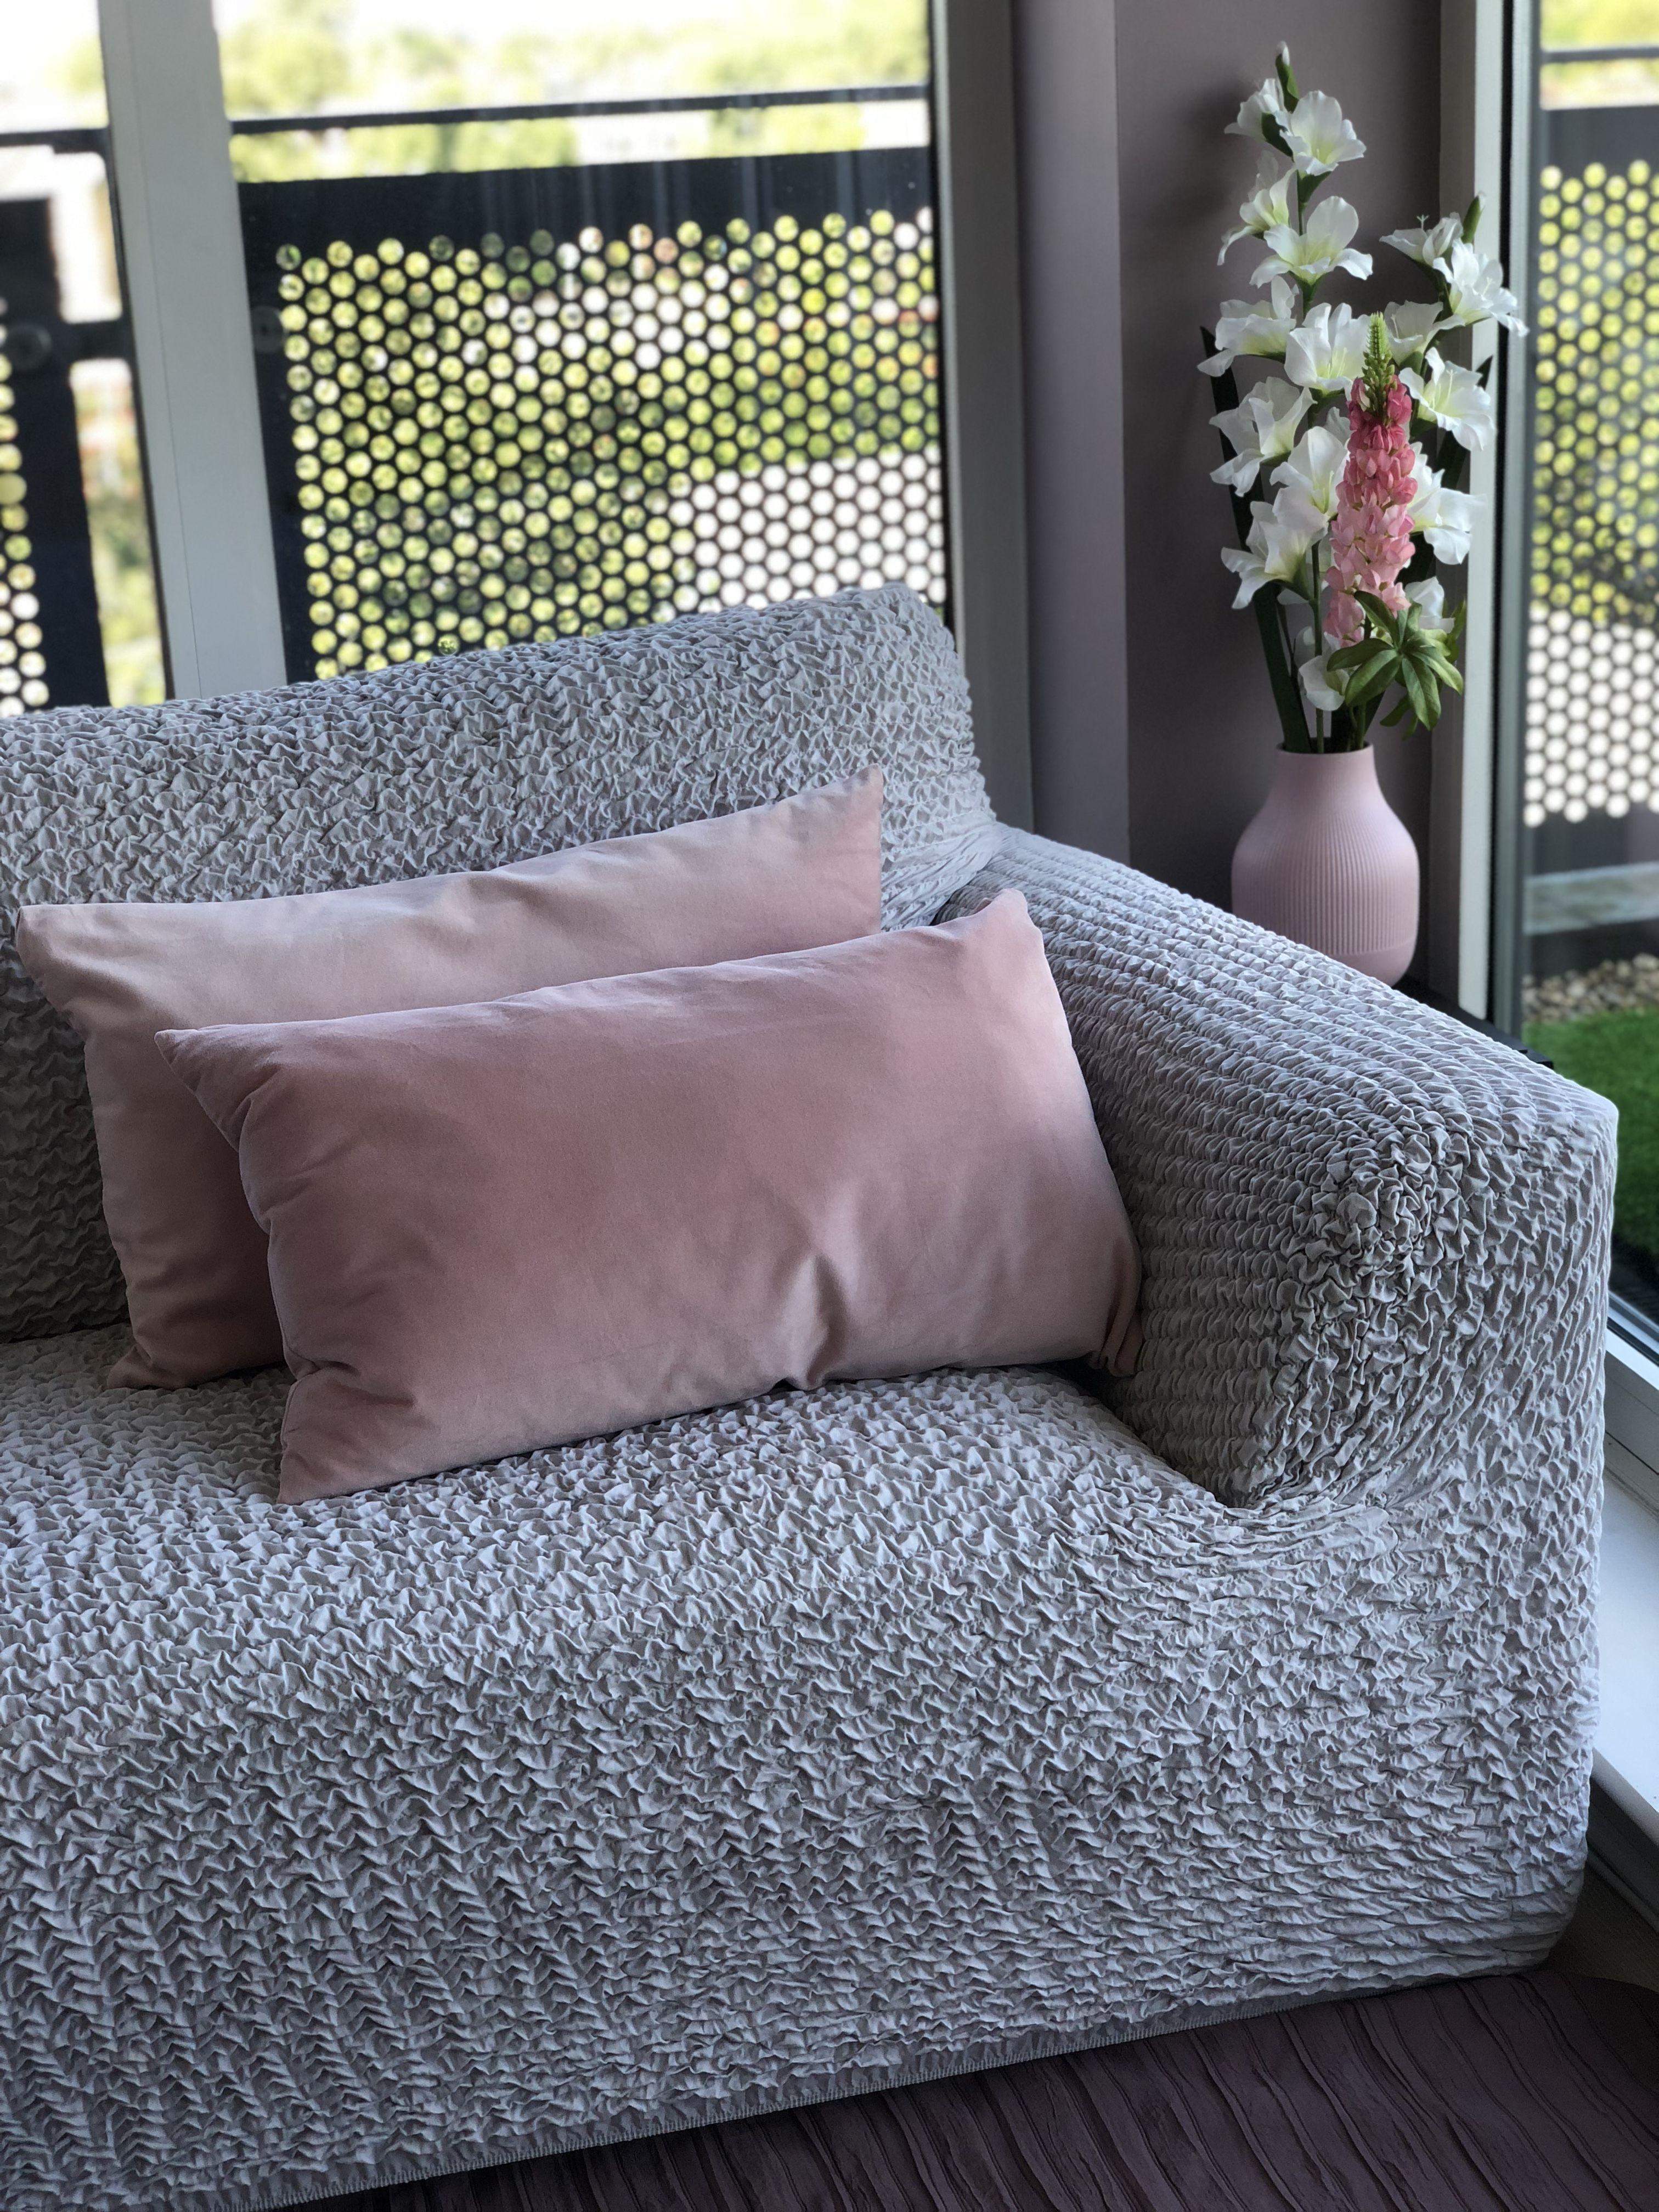 Sofa 3 Seater Slipcover, Microfibra Collection In 2020